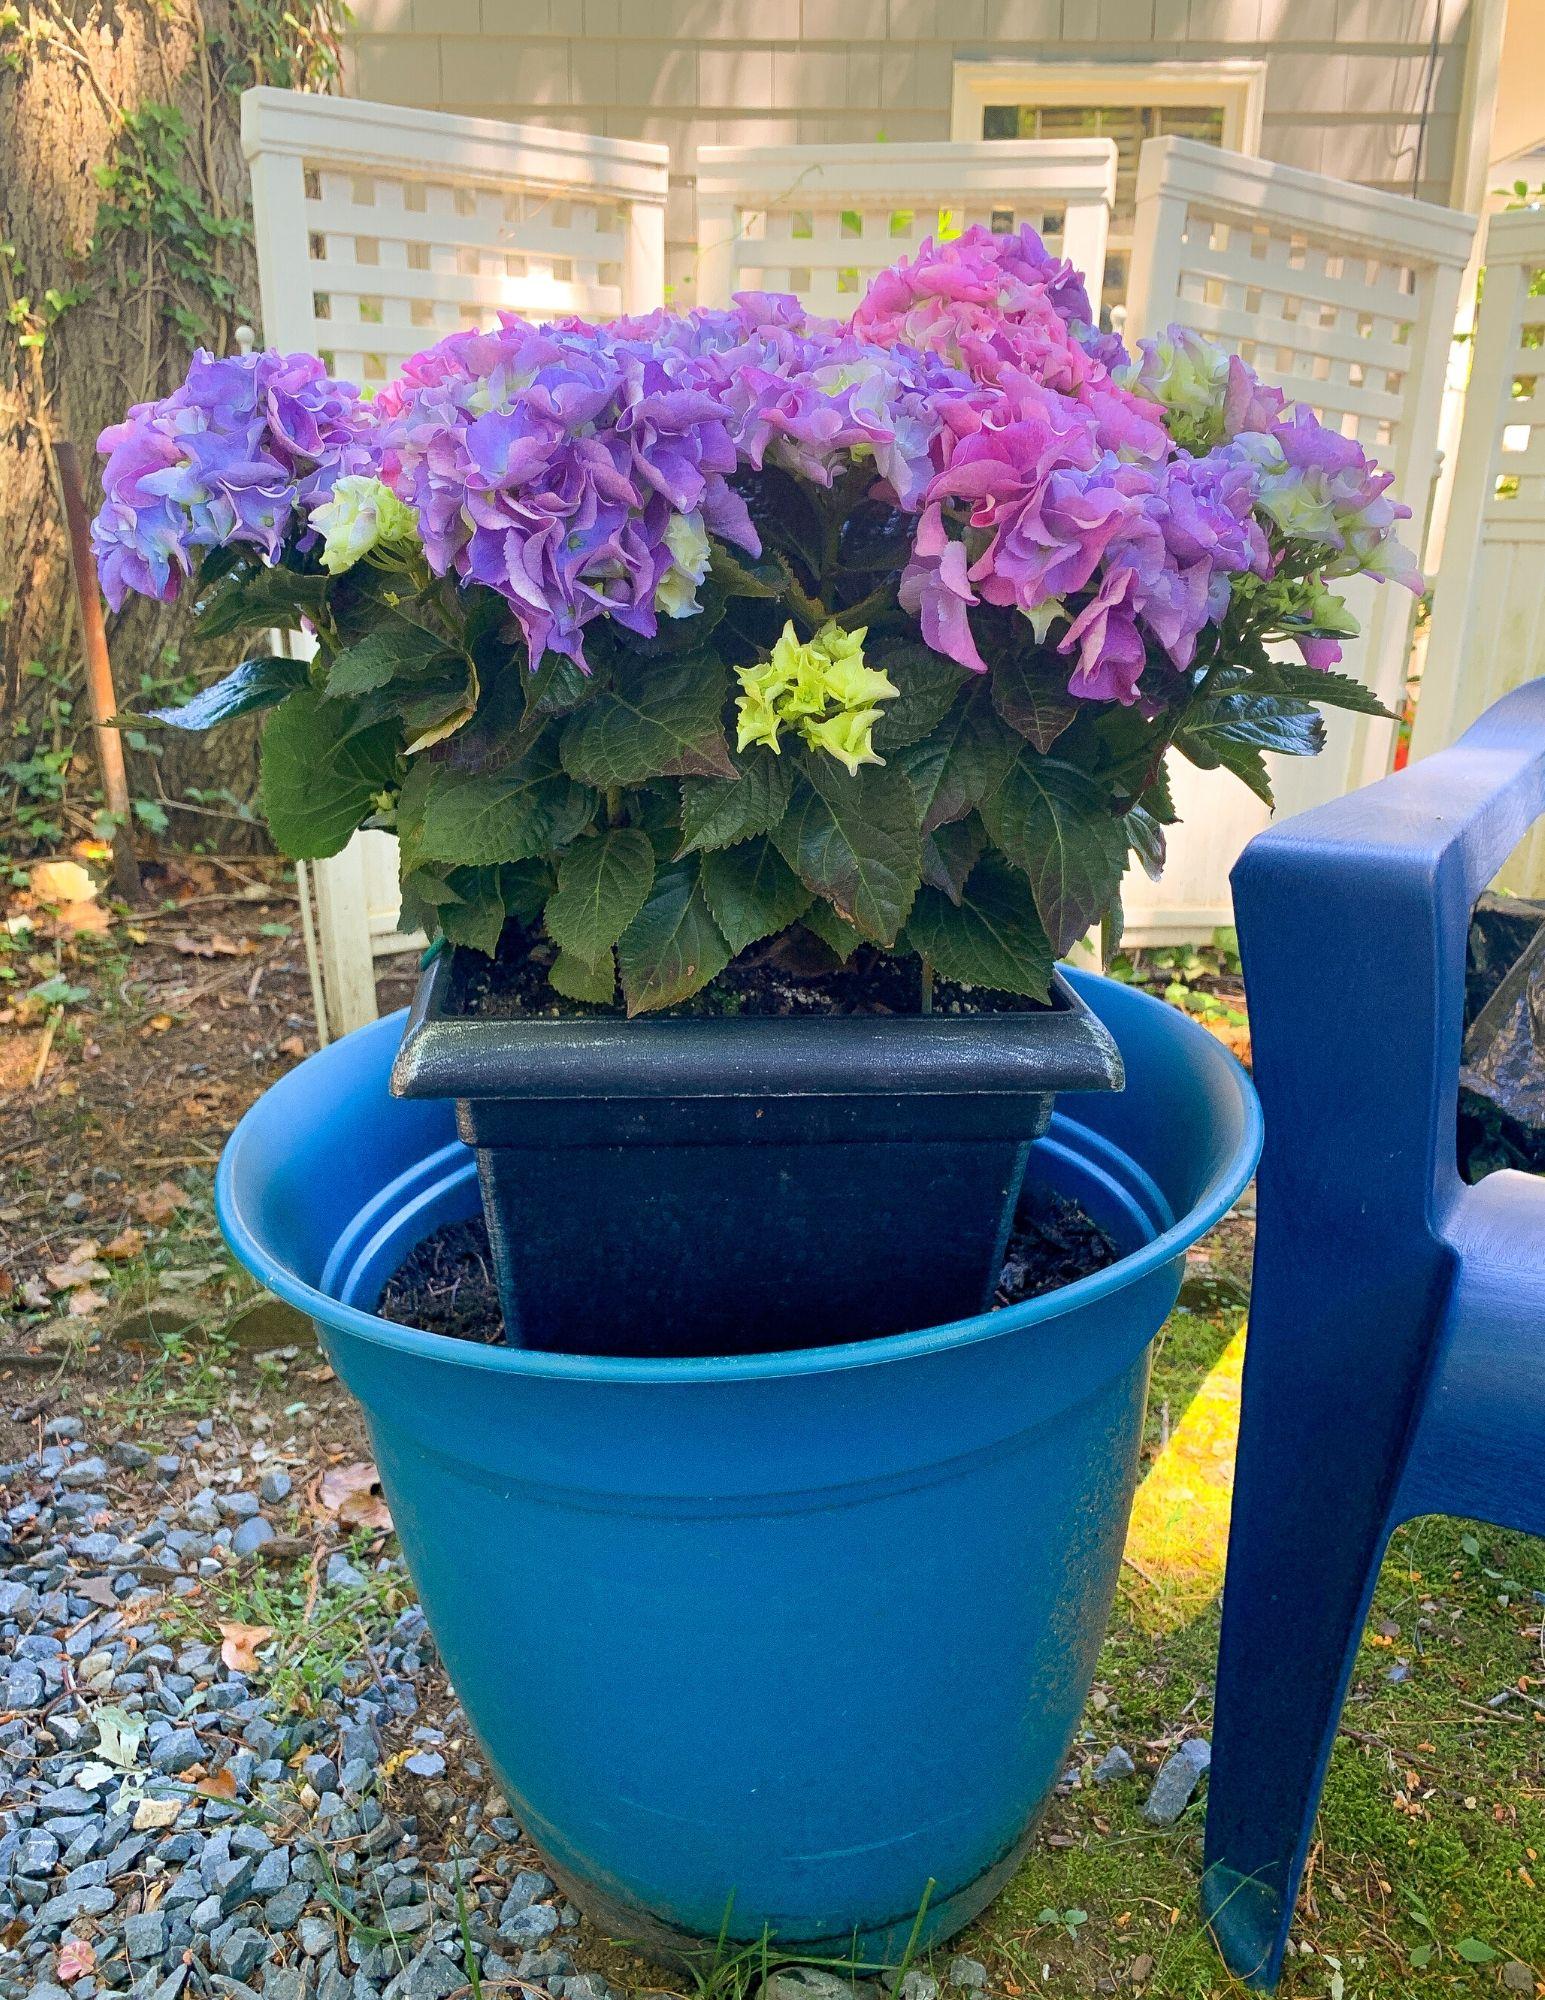 How to Plant Hydrangeas in Pots-2